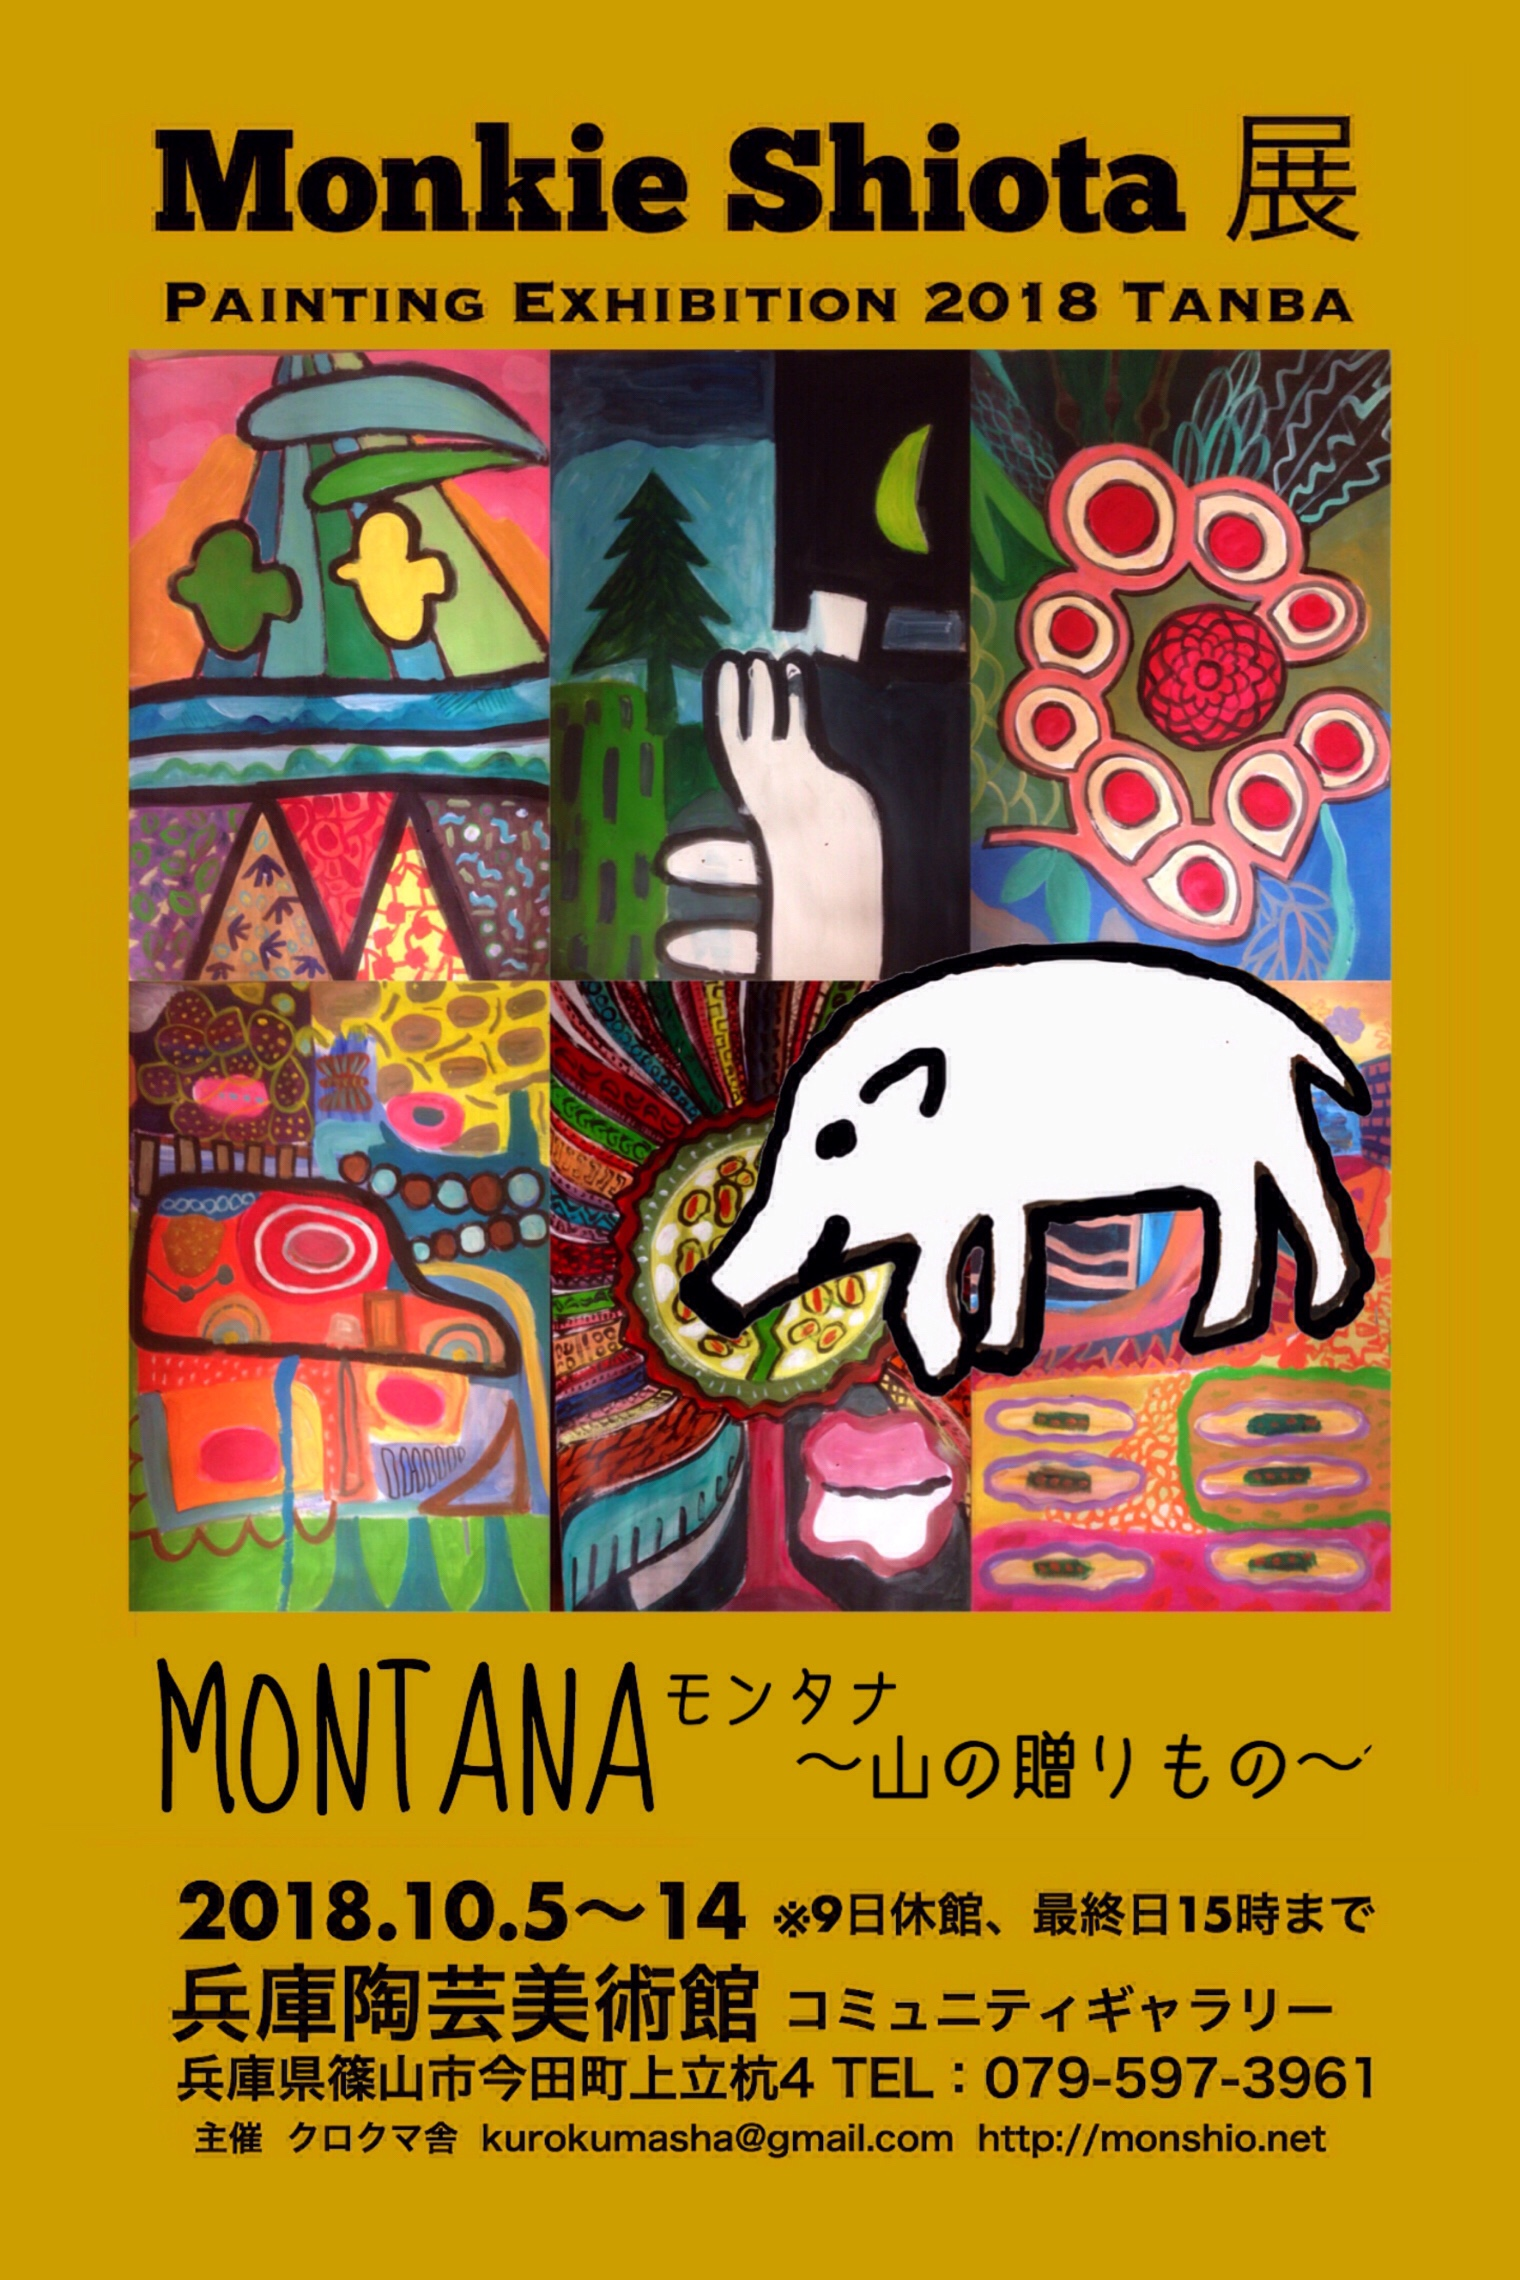 MONTANA@兵庫陶芸美術館コミュニティーギャラリー